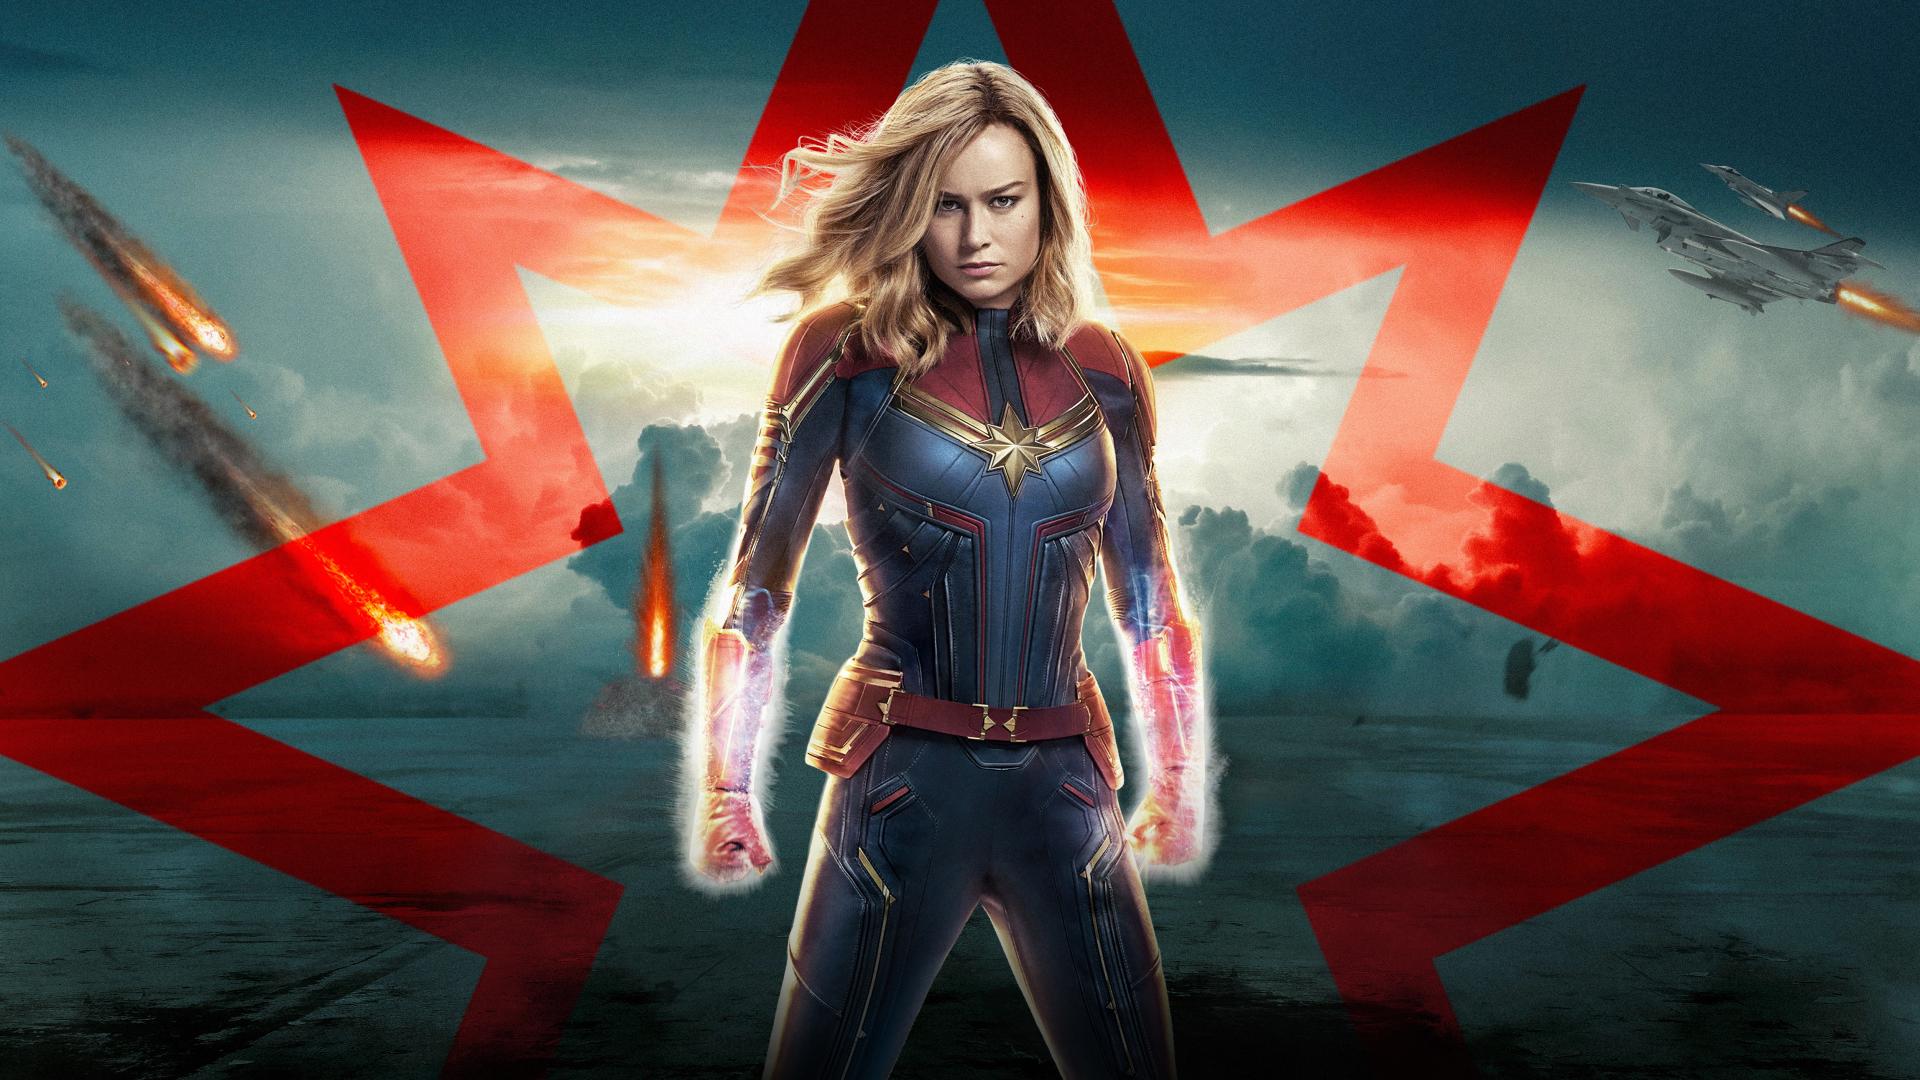 1080p Captain Marvel Hd Wallpaper